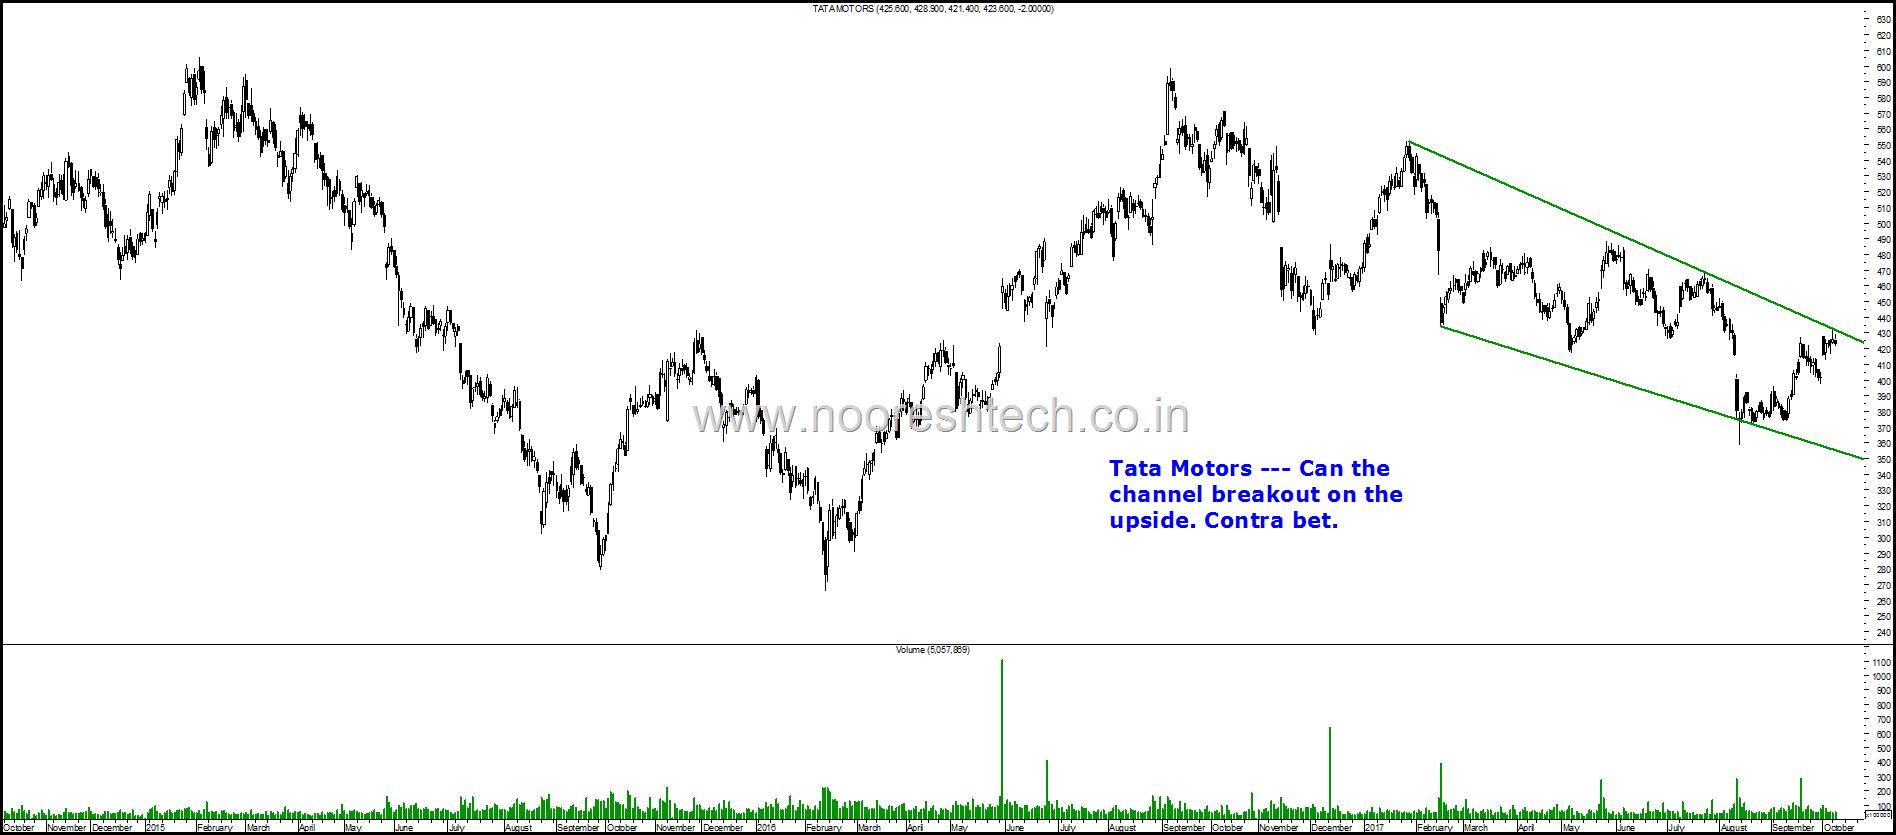 Tata Motors Blog